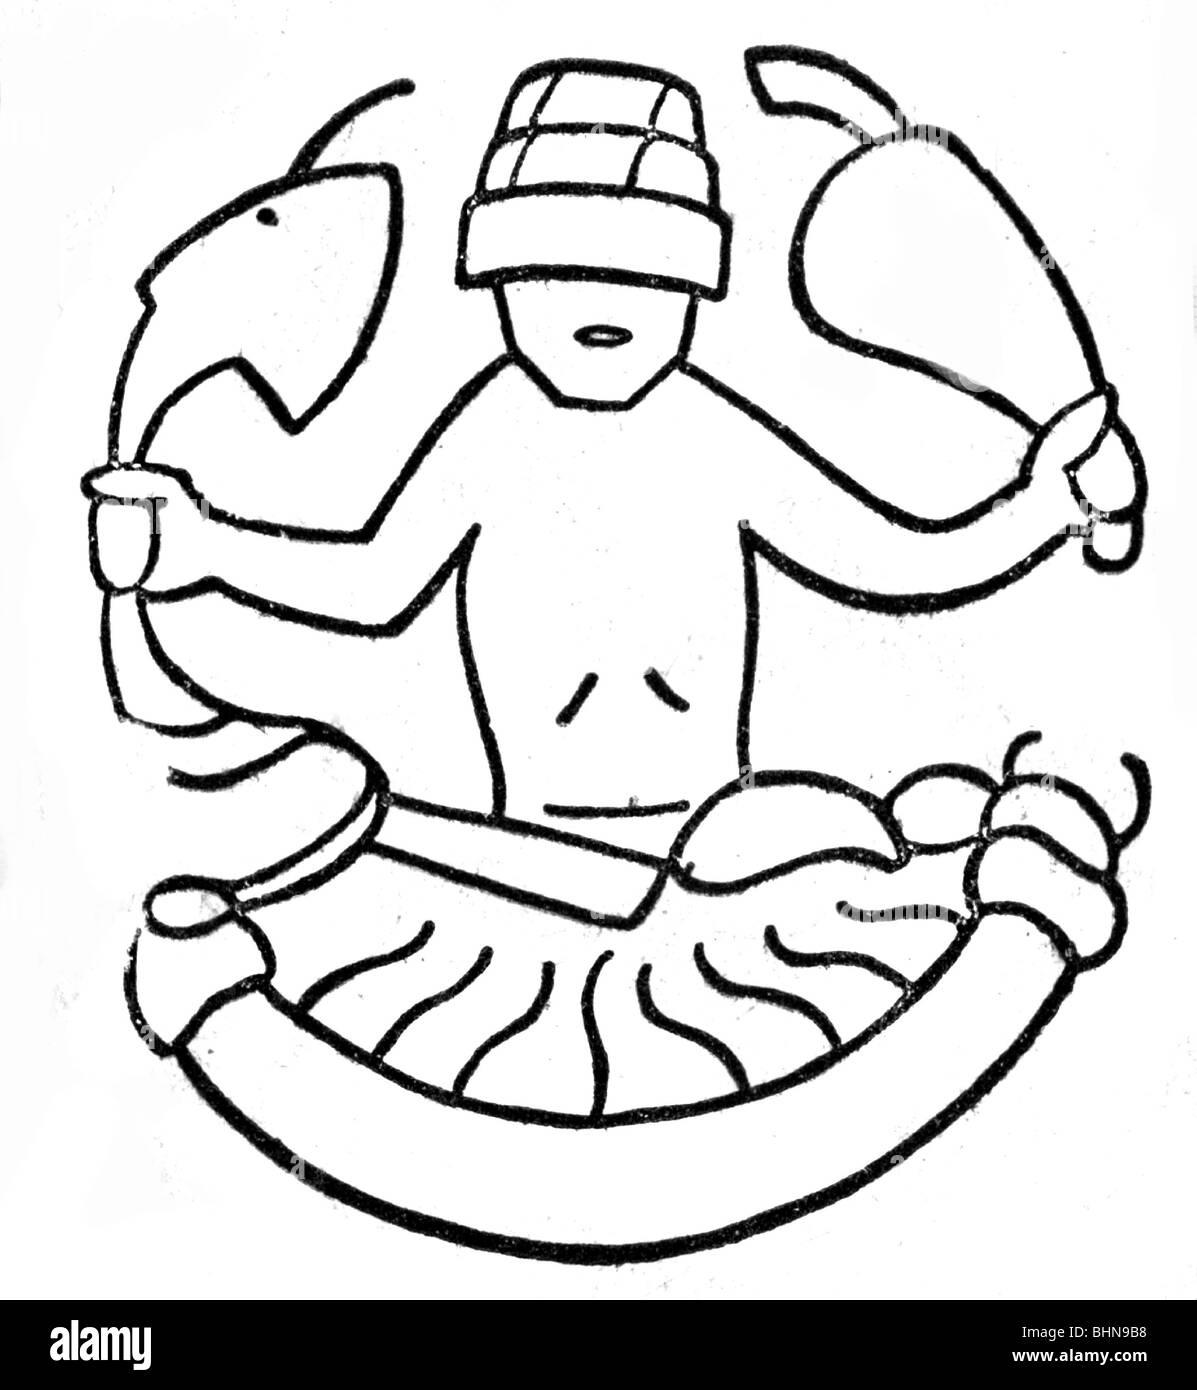 astrology, zodiac sign: Scorpius, old Arab image, Arabic, Arabian , Arab world, Scorpio, Scorpion, historic, historical, Stock Photo